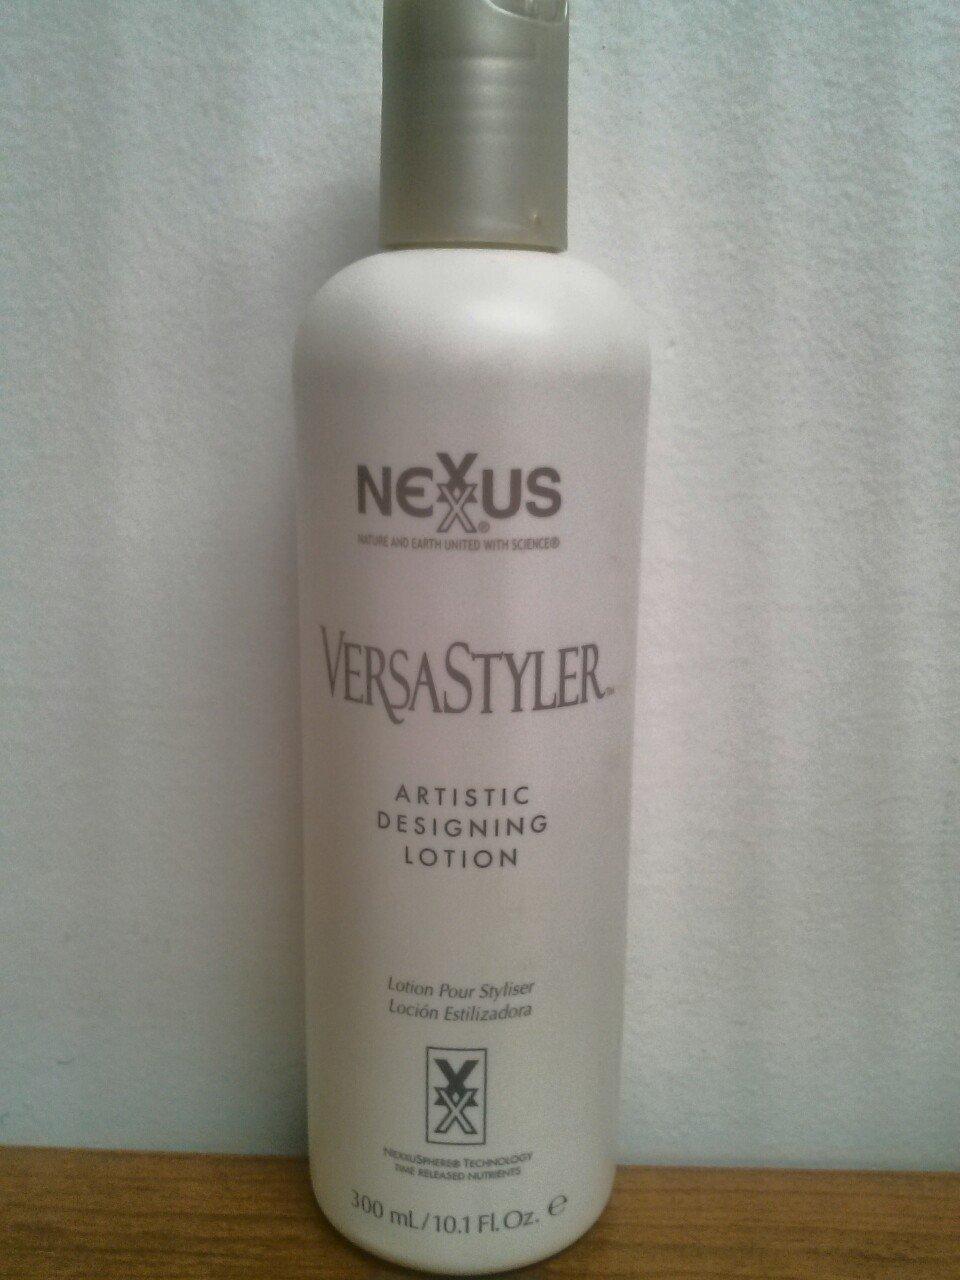 Nexxus Versastyler Artistic Designing Lotion 10.1 Fl Oz